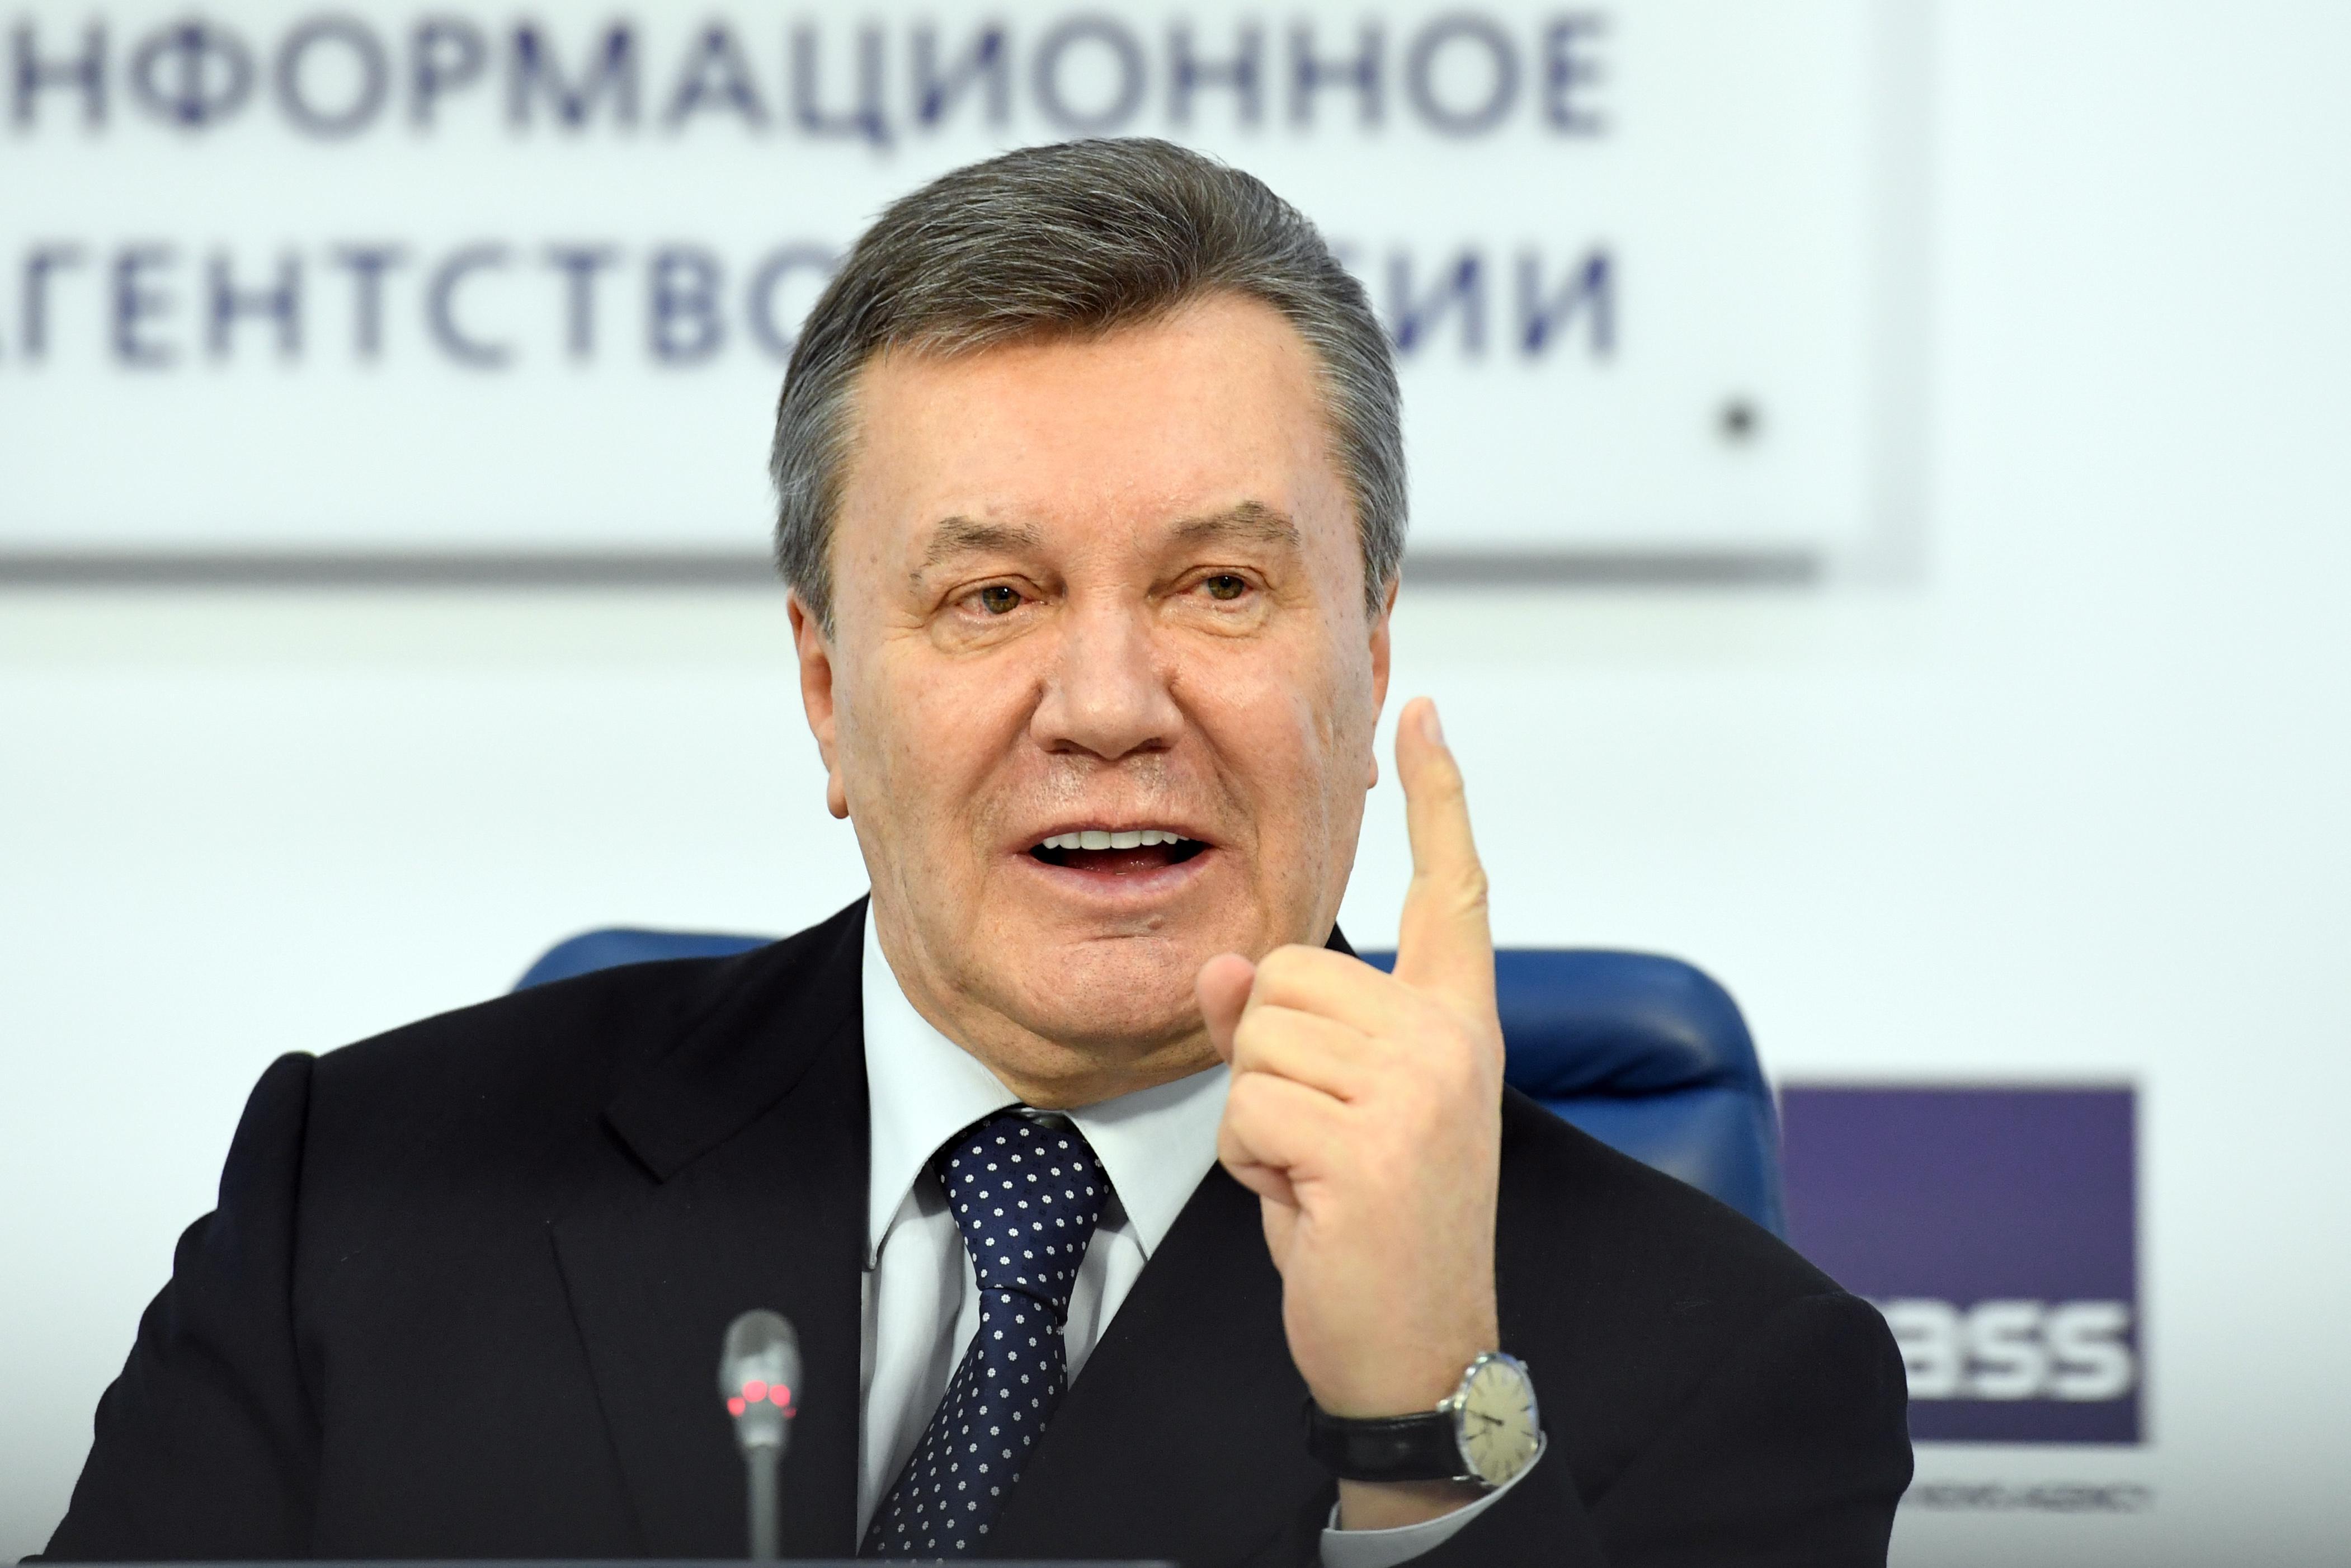 slate.com - Elliot Hannon - Wall Street Law Firm Skadden Arps Admits to Lying to DOJ About Work for Manafort and Kremlin-Aligned Ukrainian President